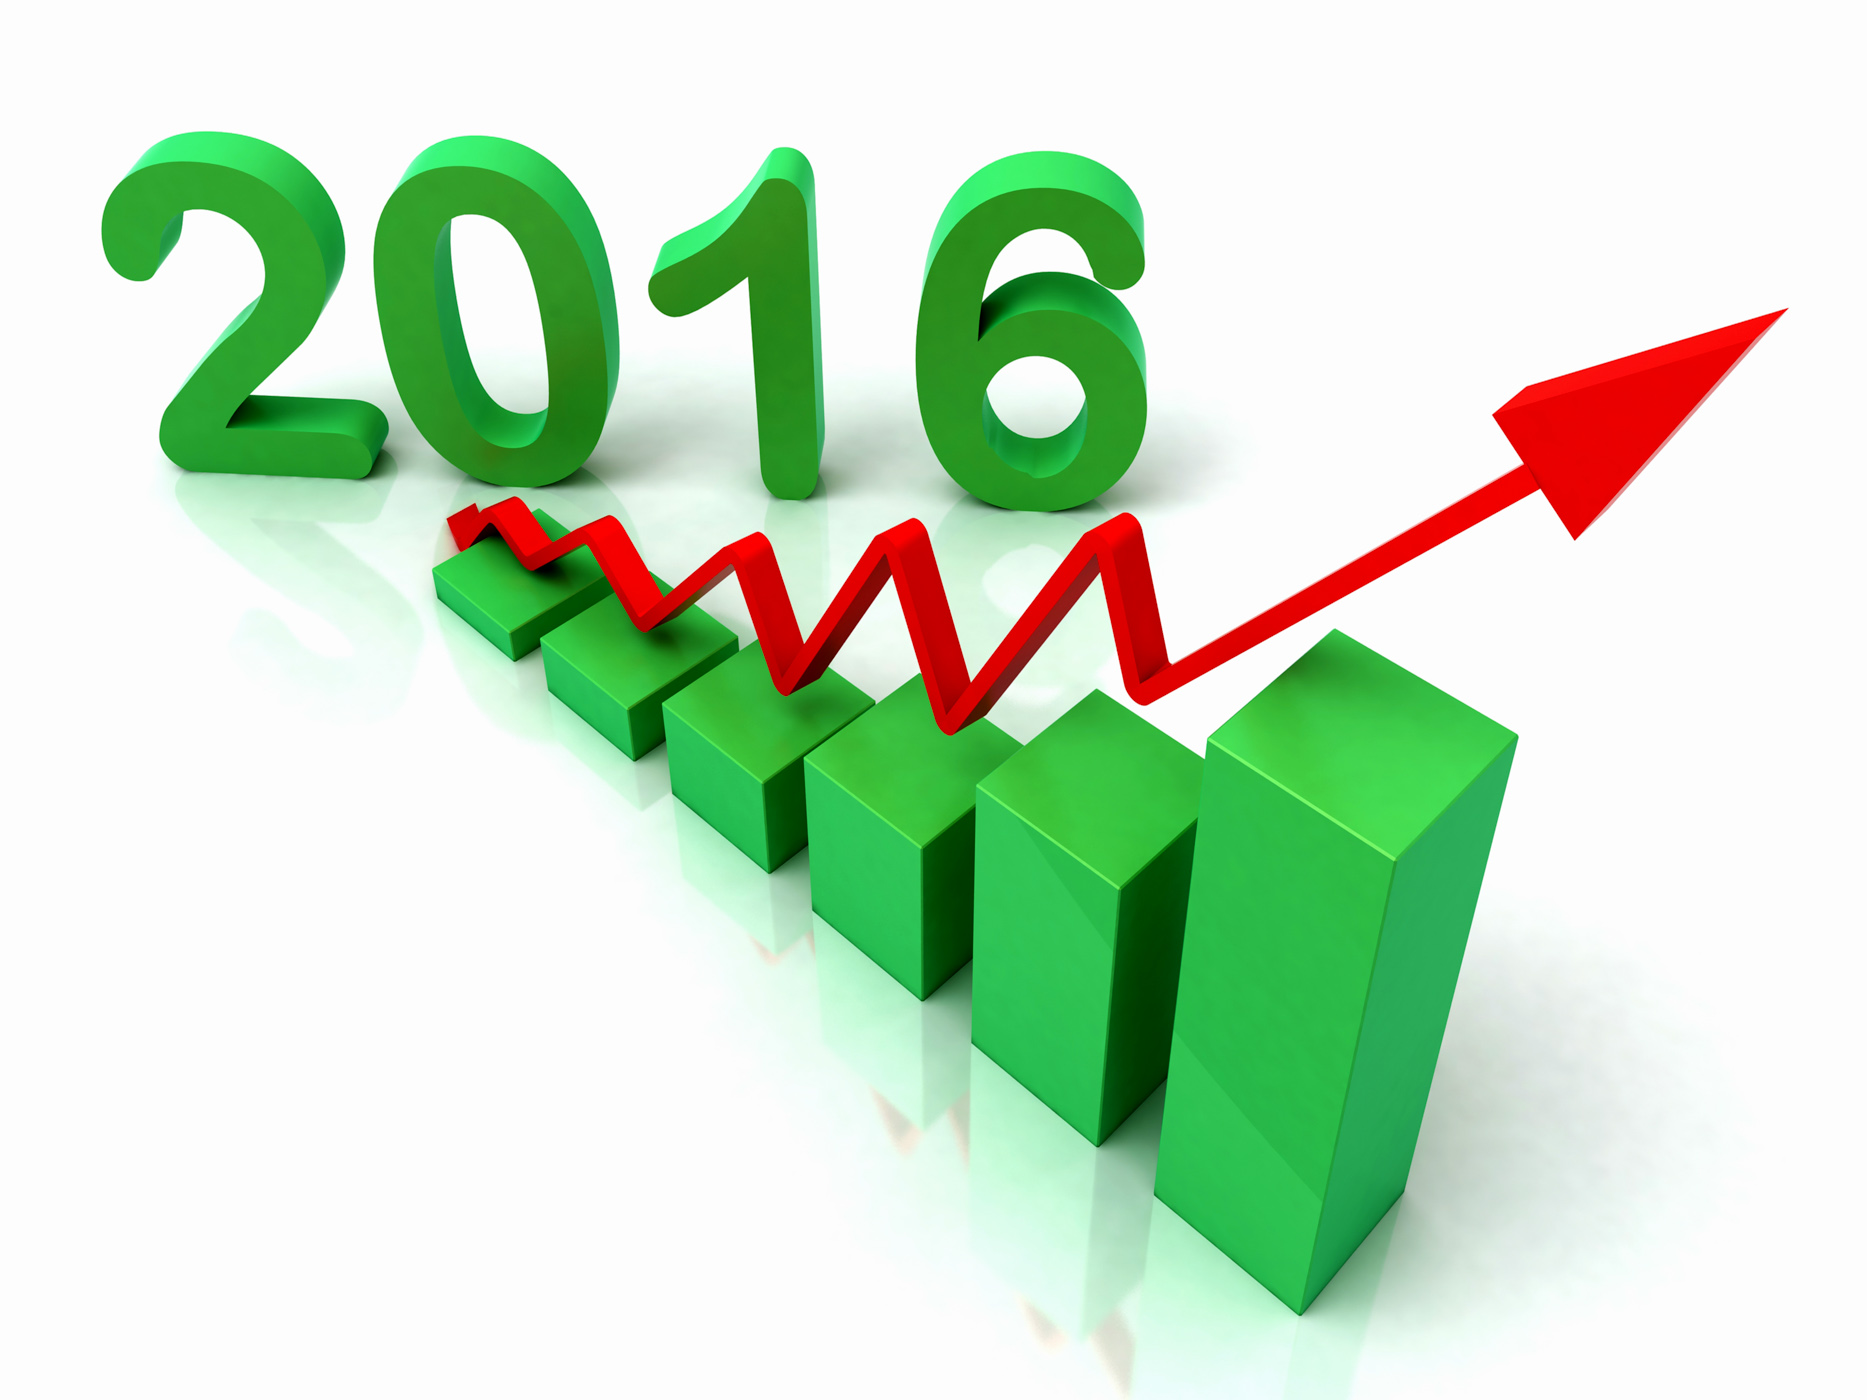 2016 Green Bar Chart Shows Budget, Increasing, Plan, Increase, Growth, HQ Photo